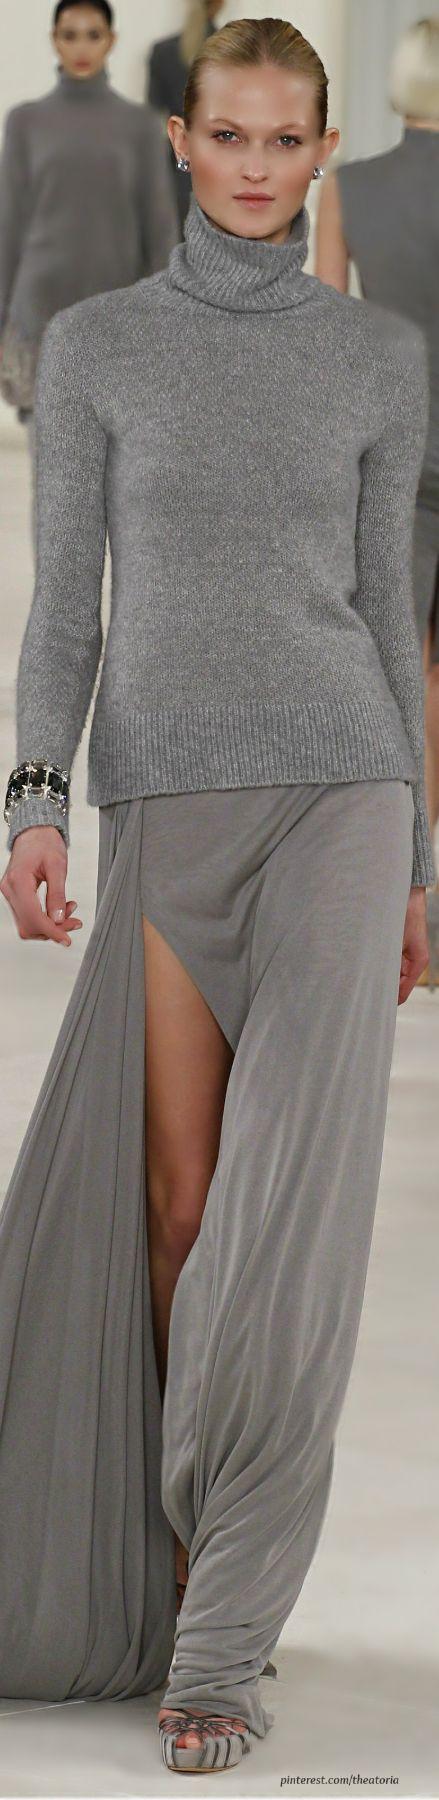 Ralph Lauren Autumn/Winter 2014-15 Ready-To-Wear